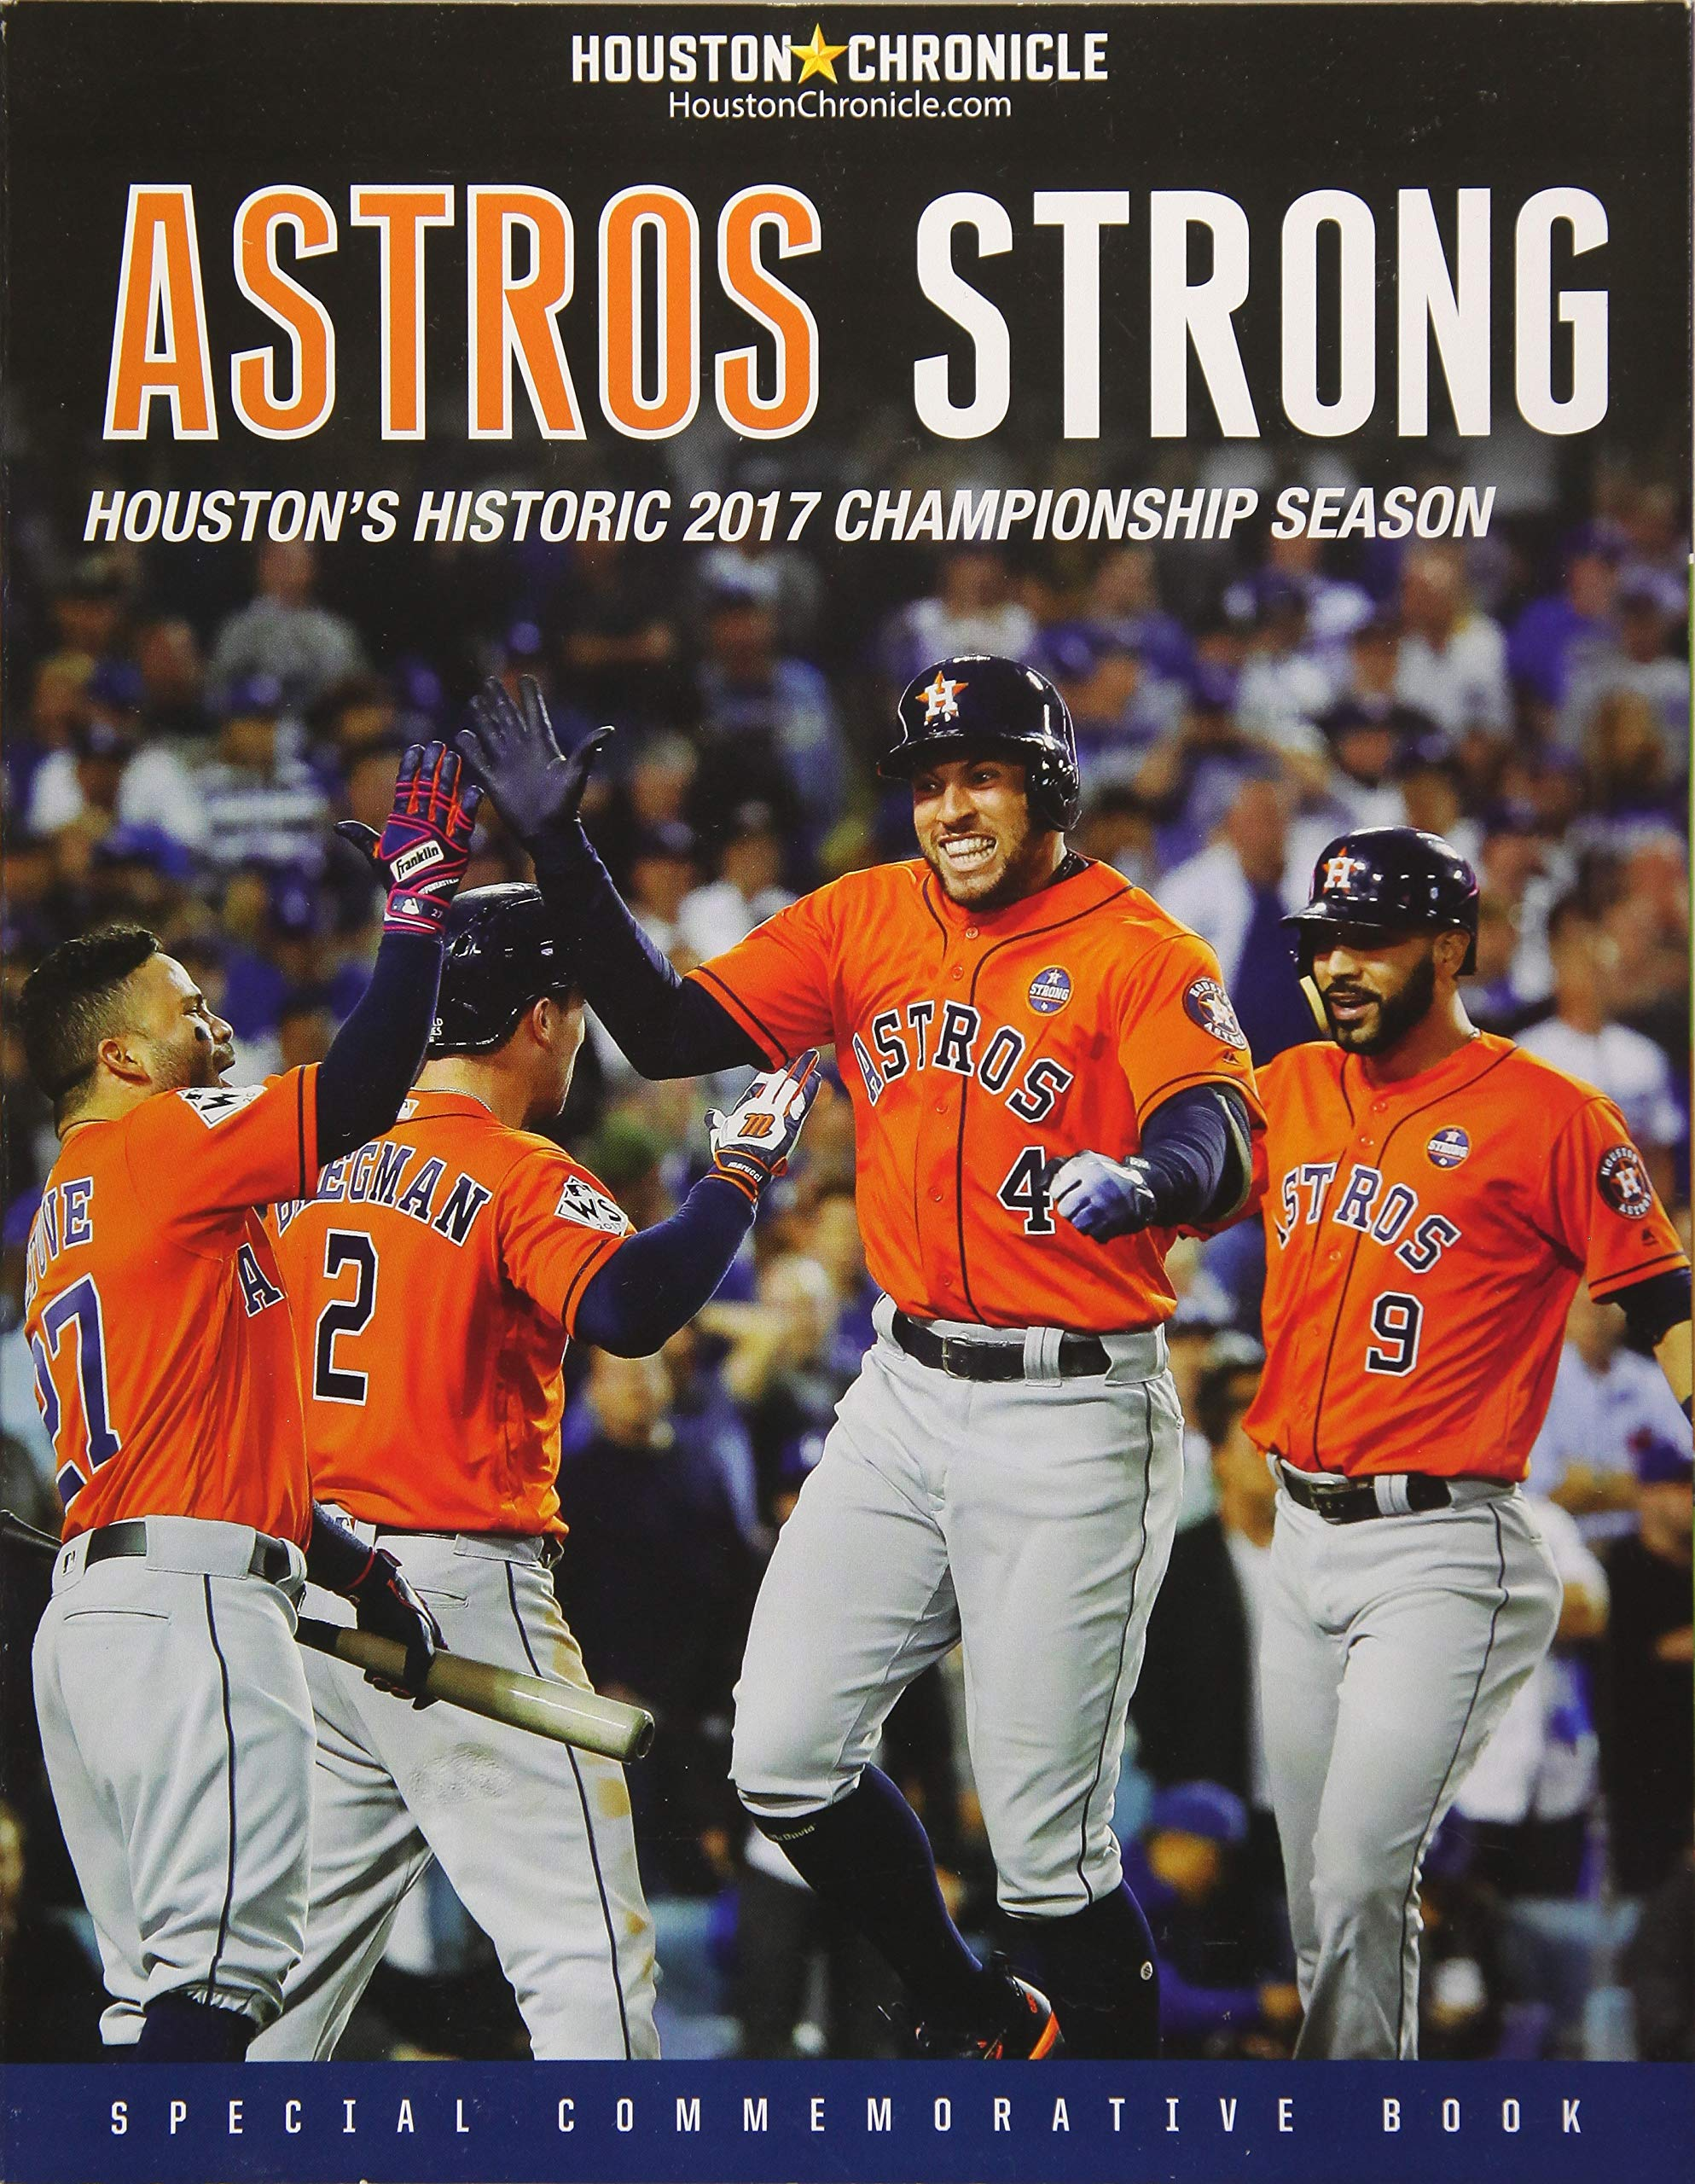 Astros Strong: Houston's Historic 2017 Championship Season